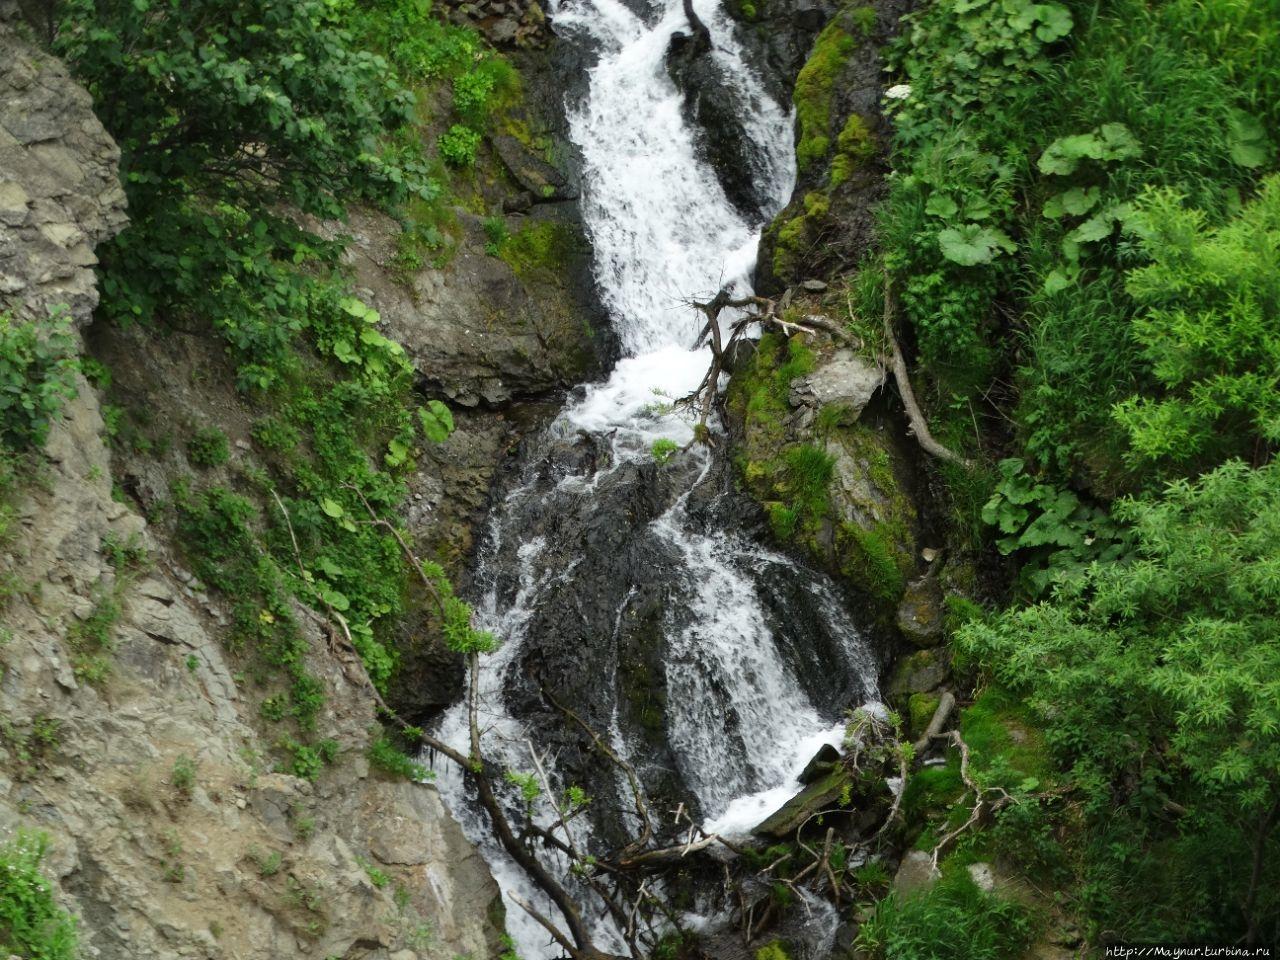 Самый  низ  водопада, где